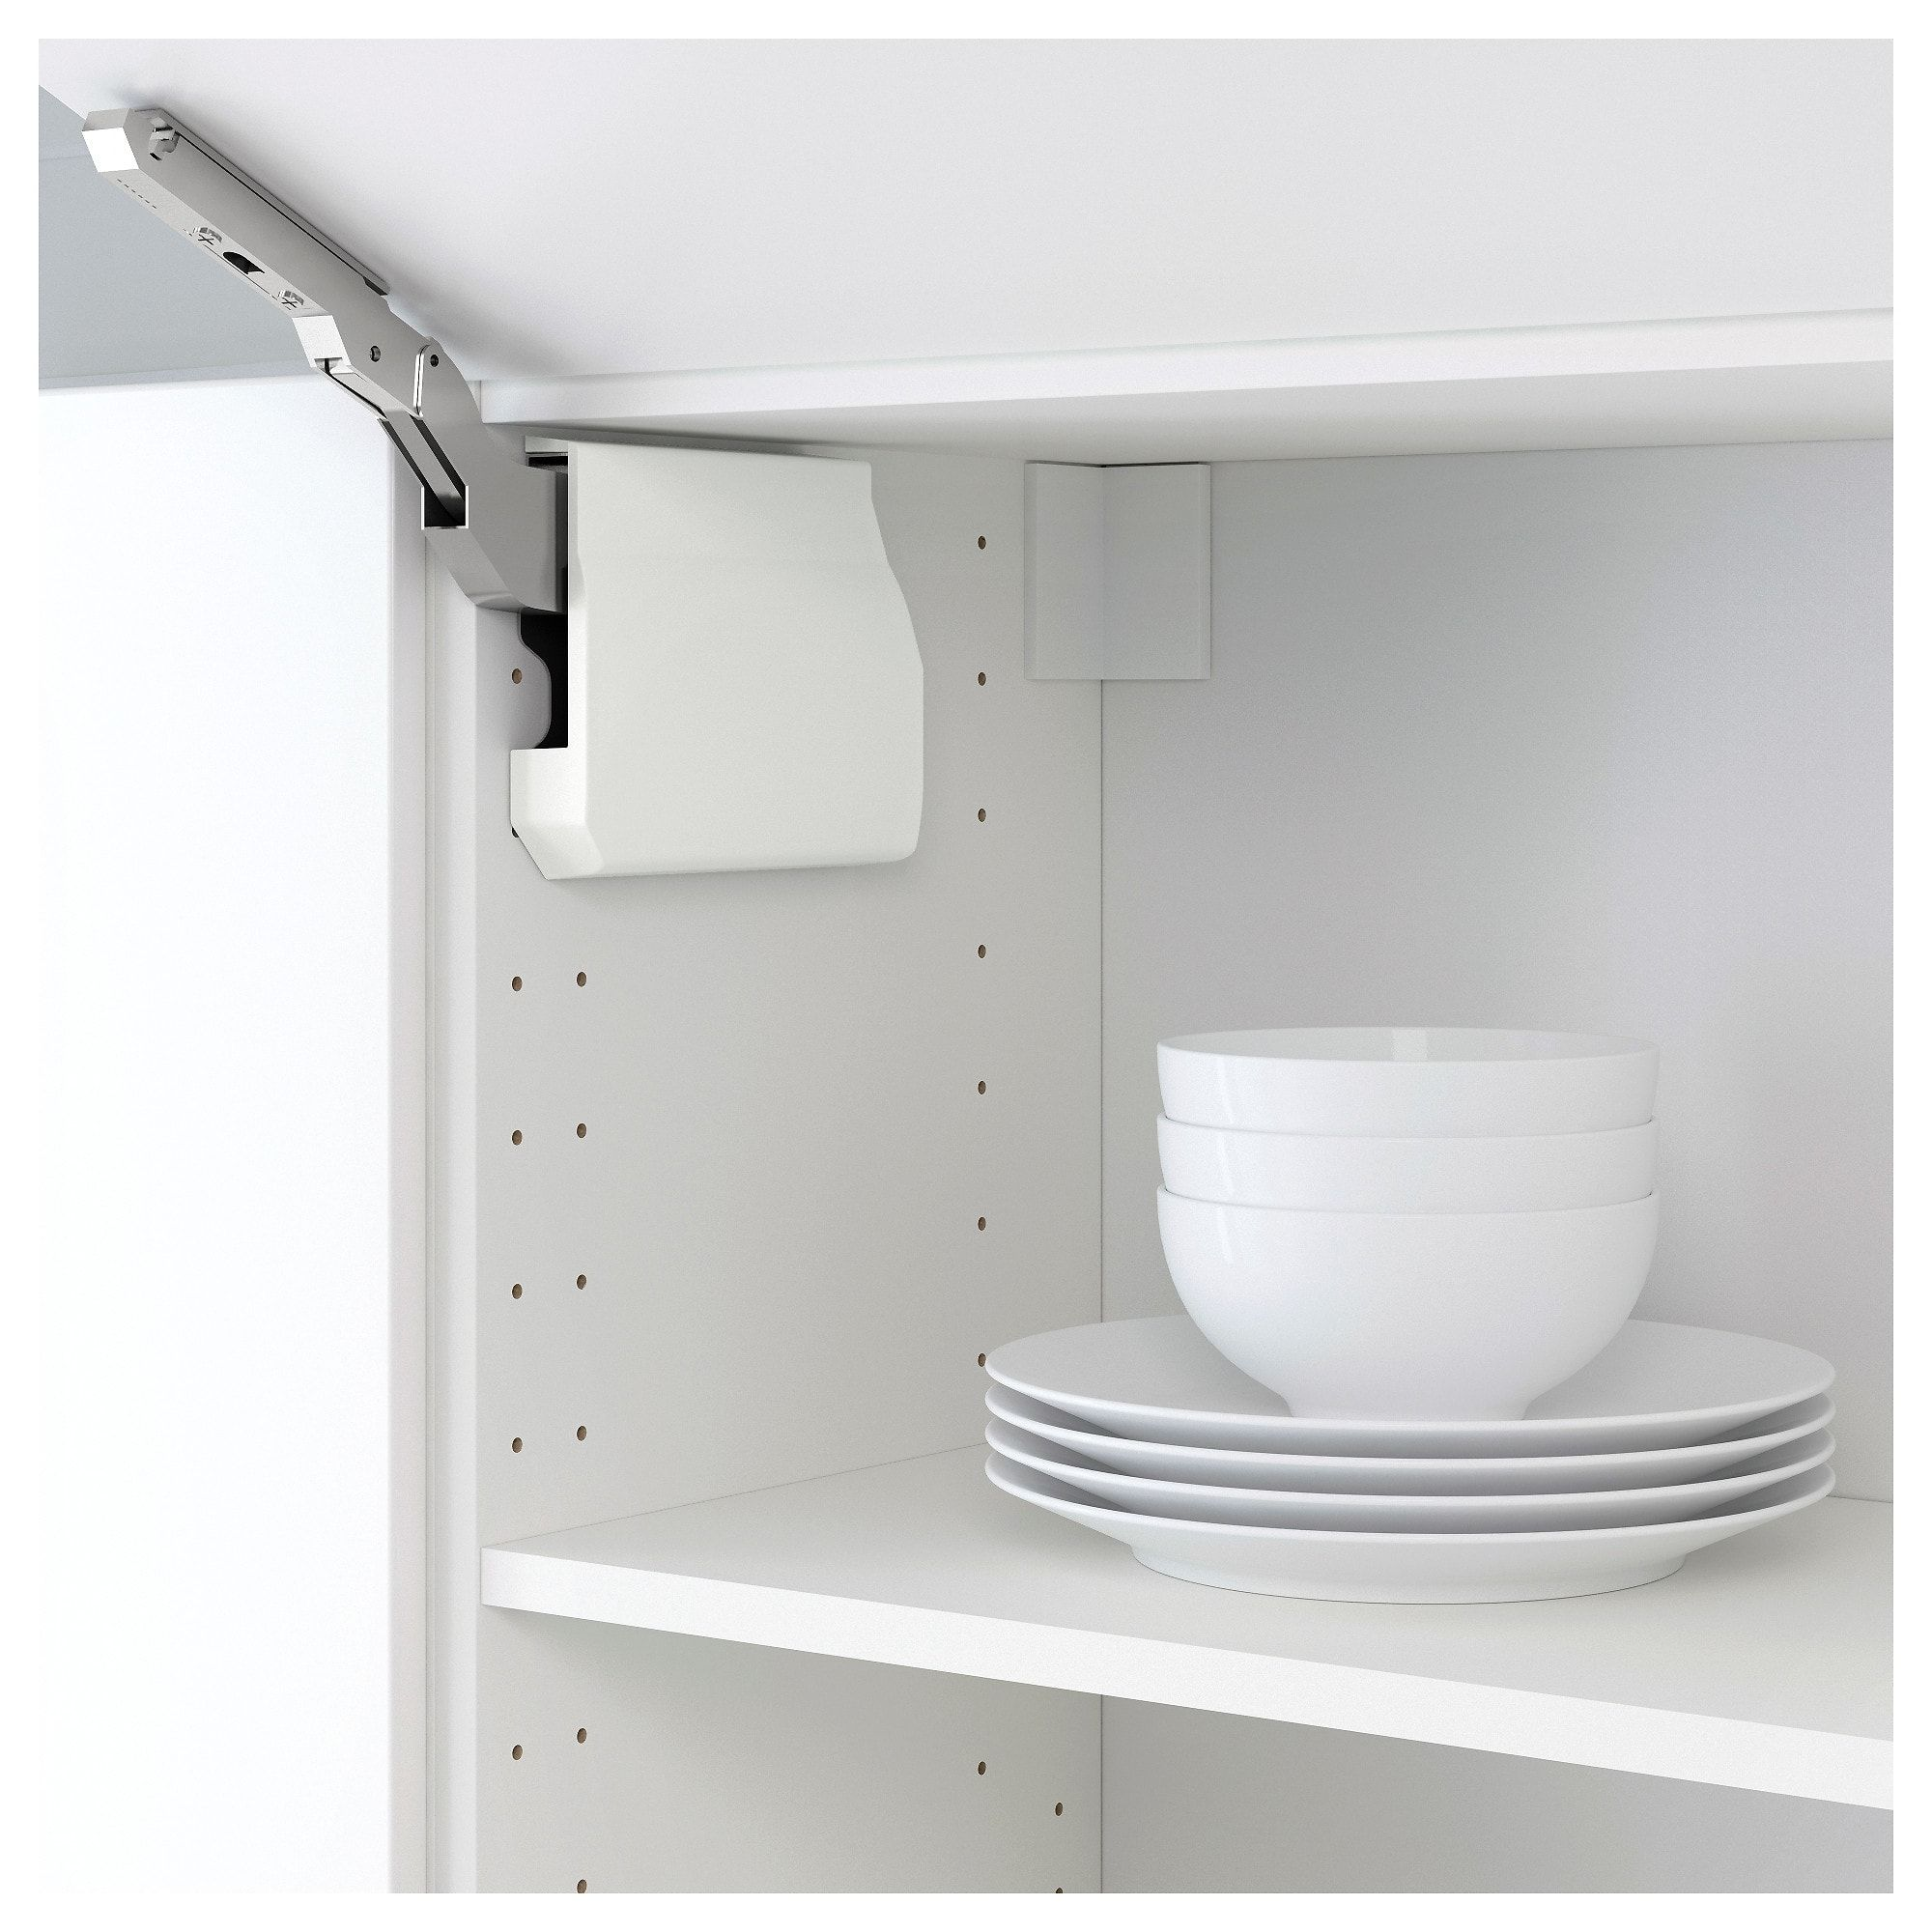 IKEA UTRUSTA Large hinge for horizontal door white